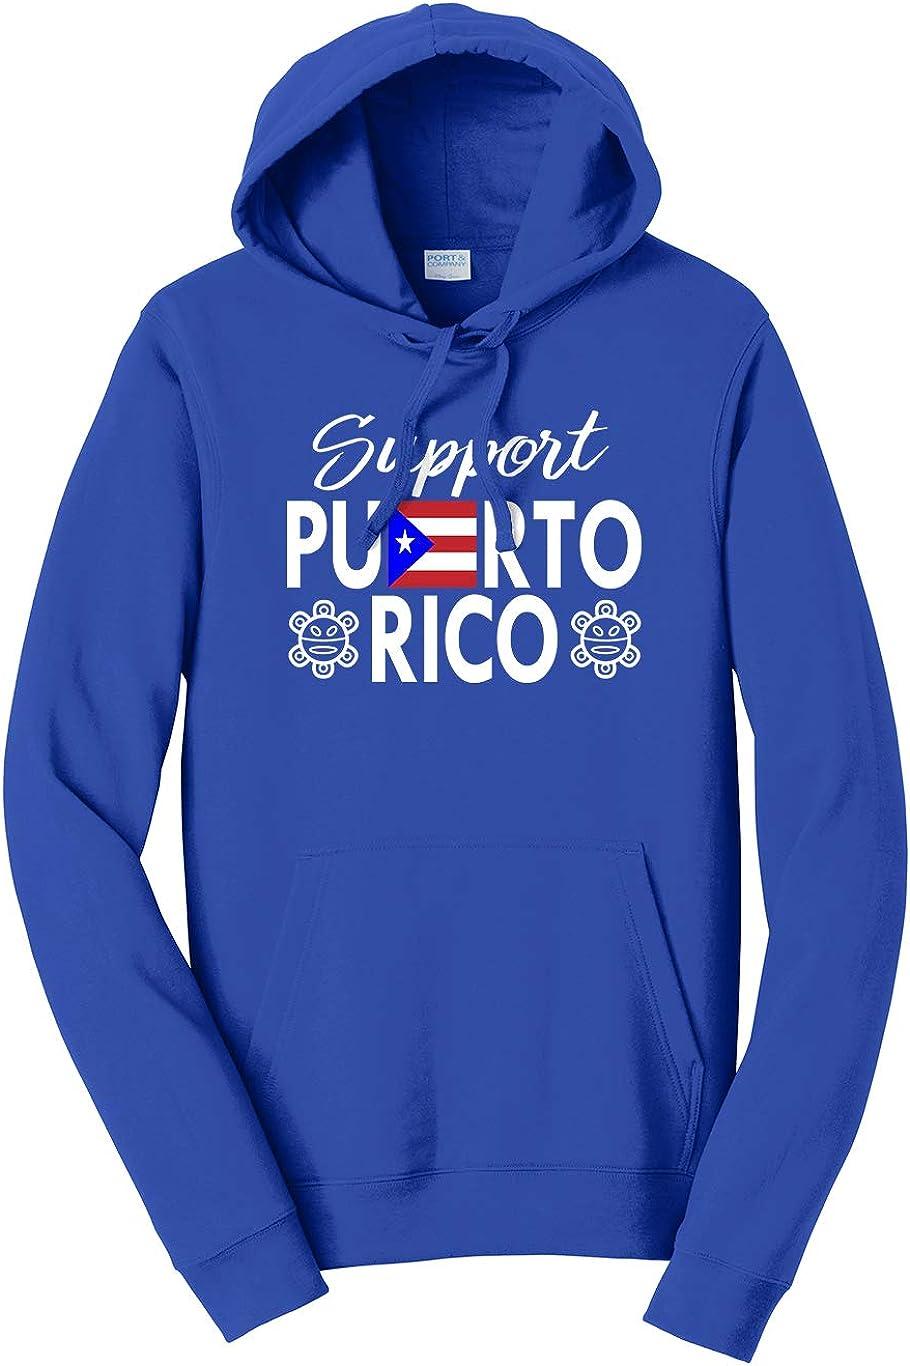 Tenacitee Unisex Support Puerto Rico Hooded Sweatshirt